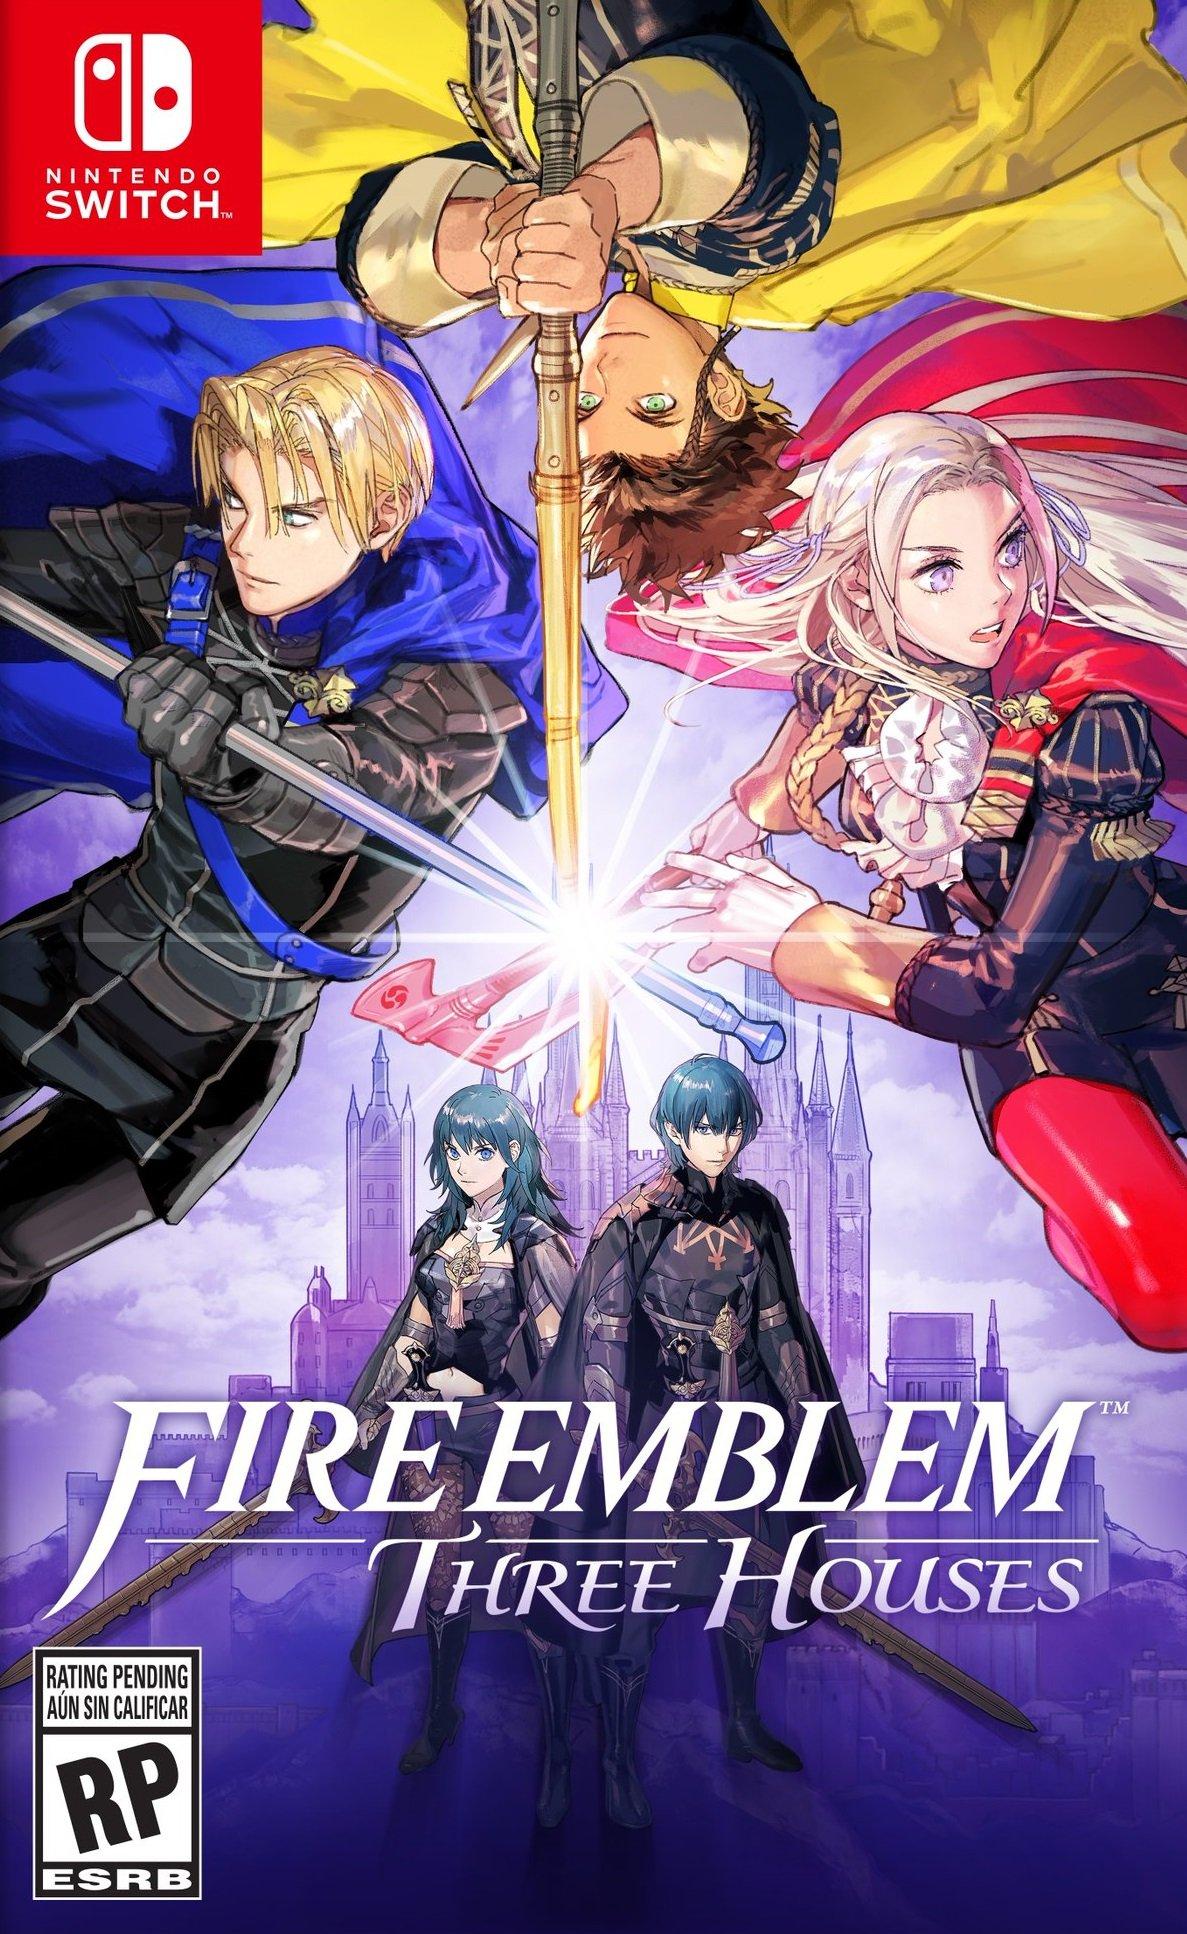 jaquette du jeu vidéo Fire Emblem : Three Houses